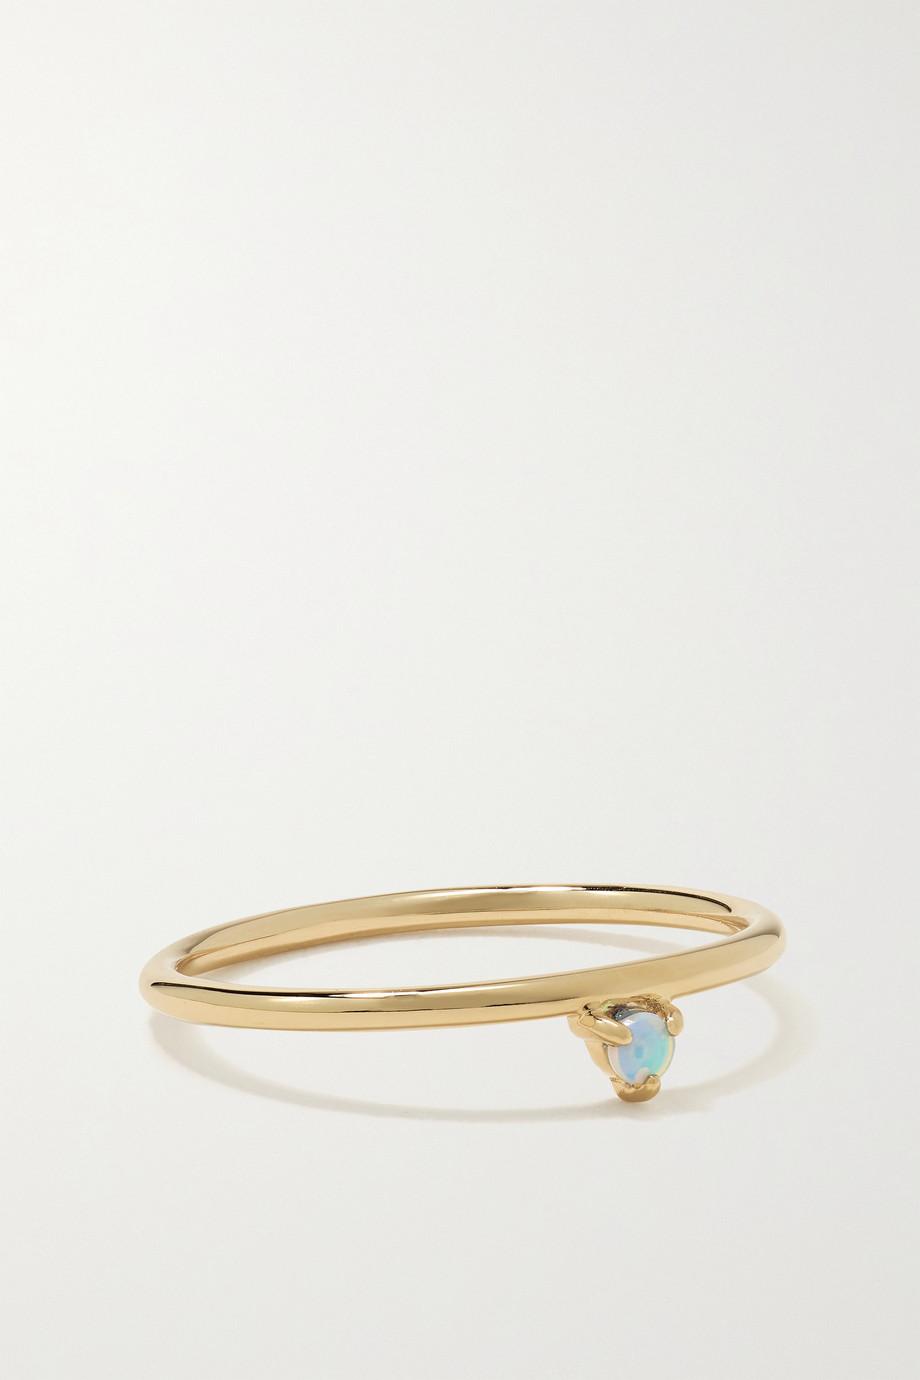 Wwake One-Step gold opal ring